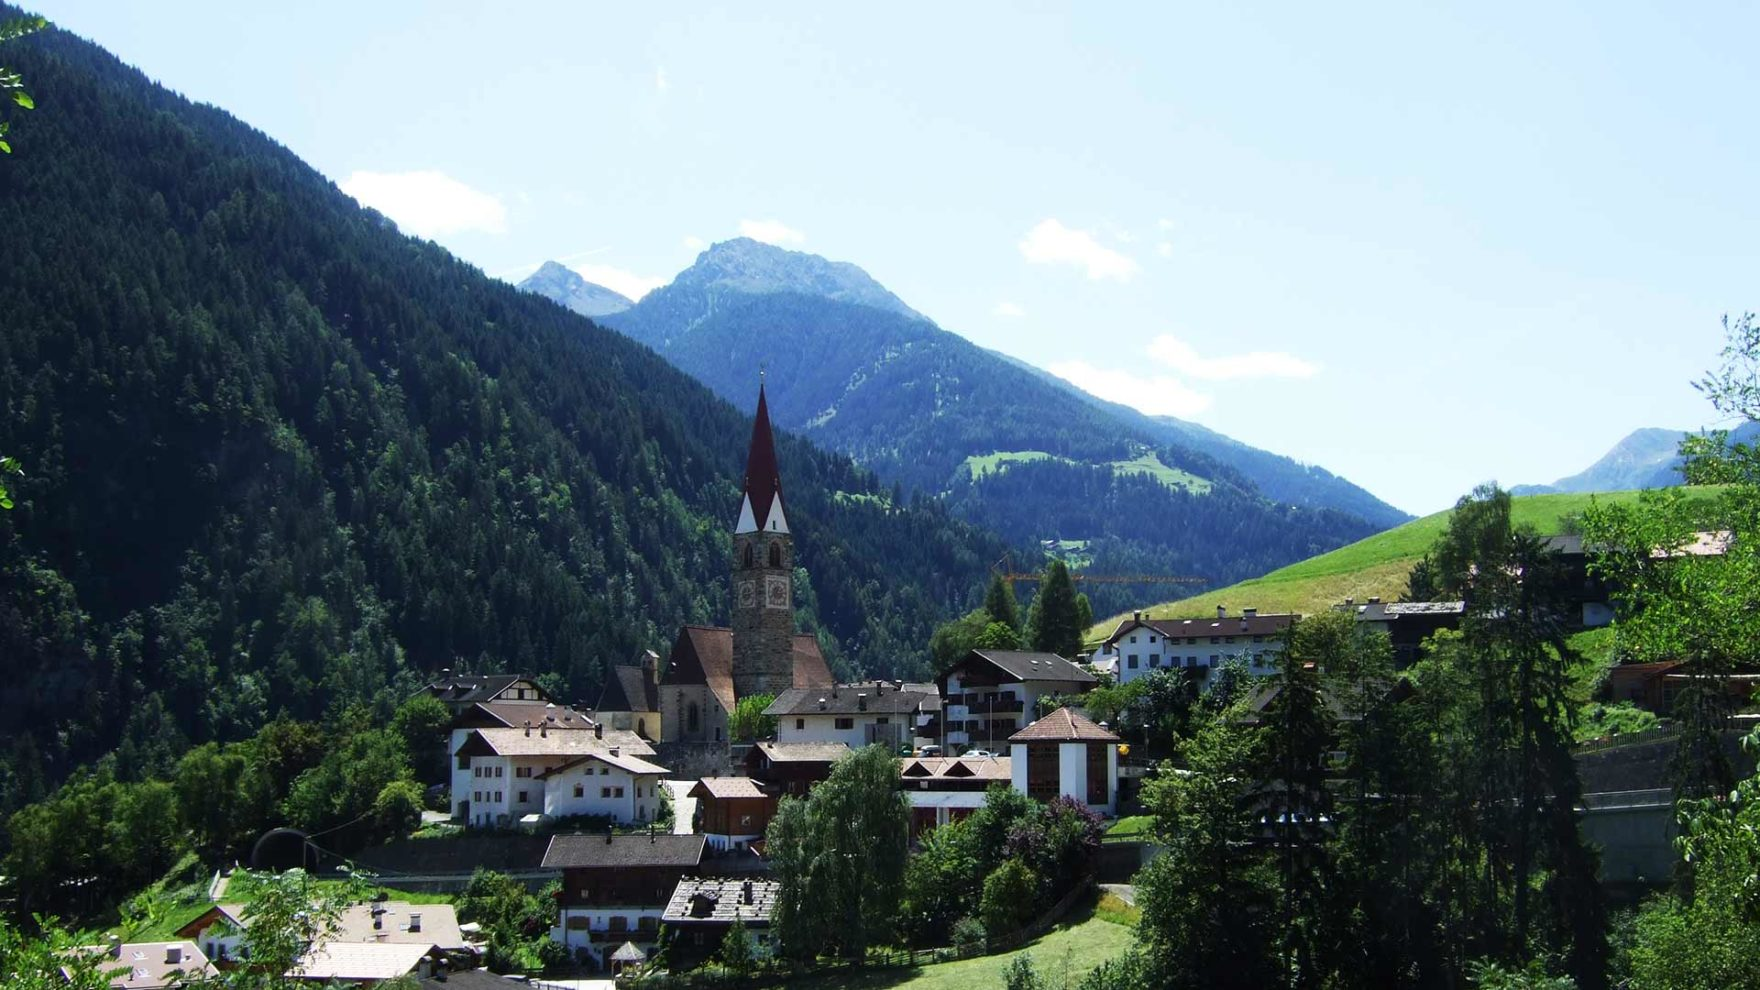 San Pancrazio in Alto Adige